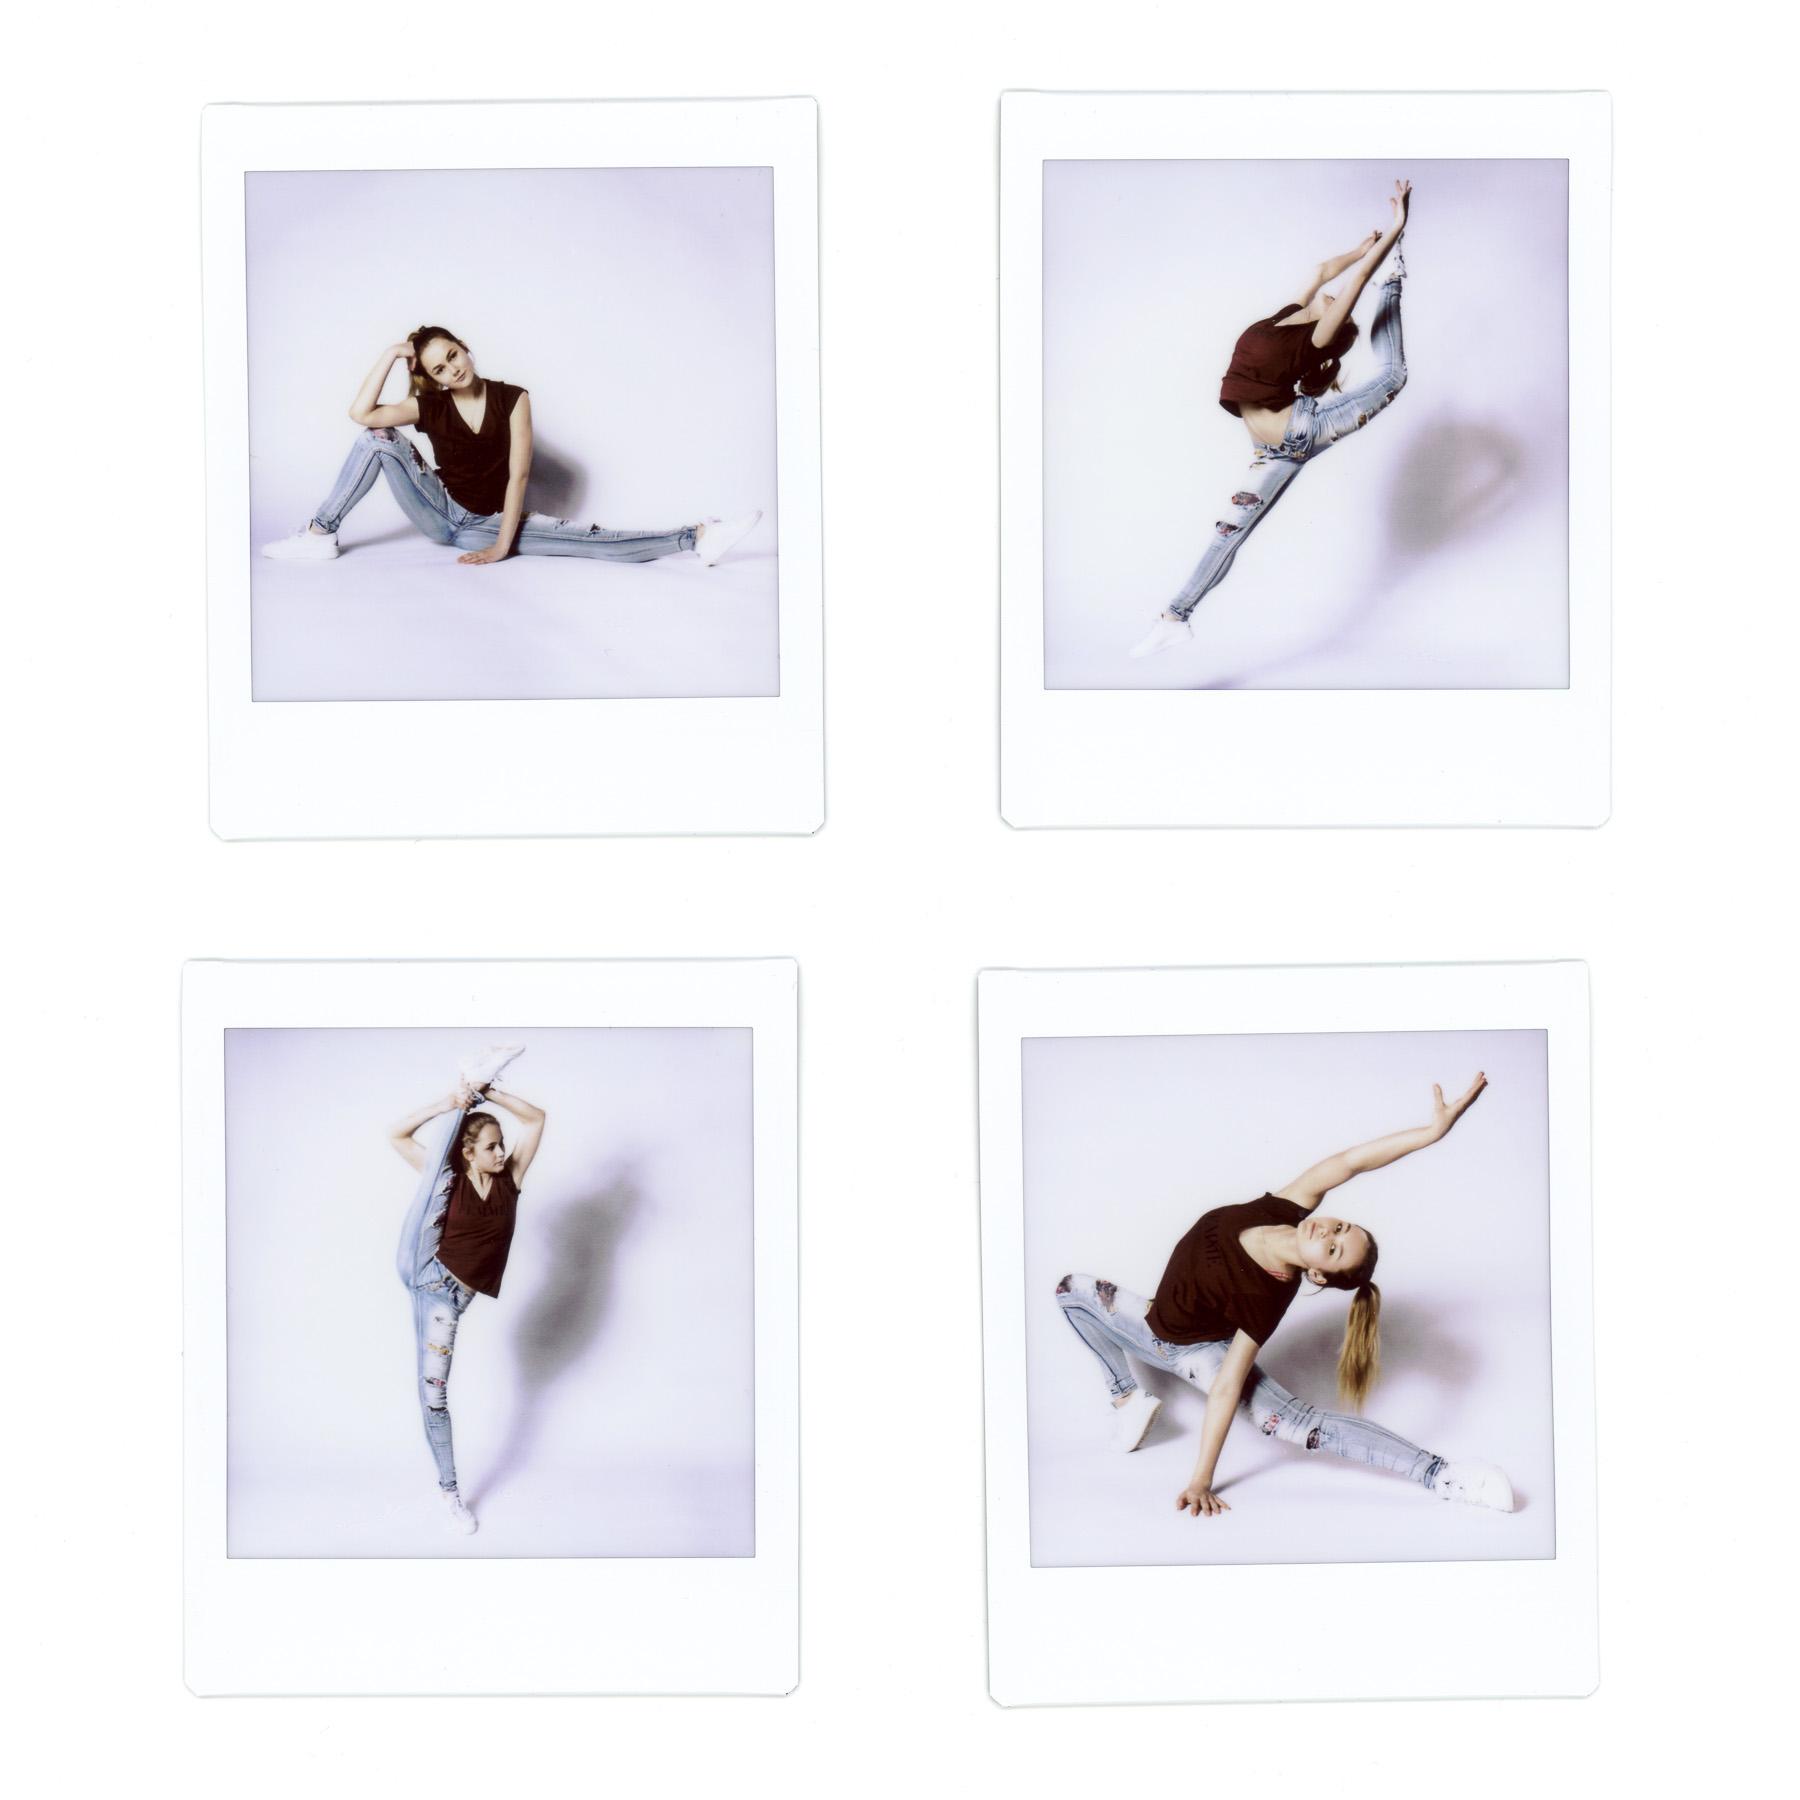 Portfolio(20180419 – Shooting Daria Ivakhnenko – Polas – 16)